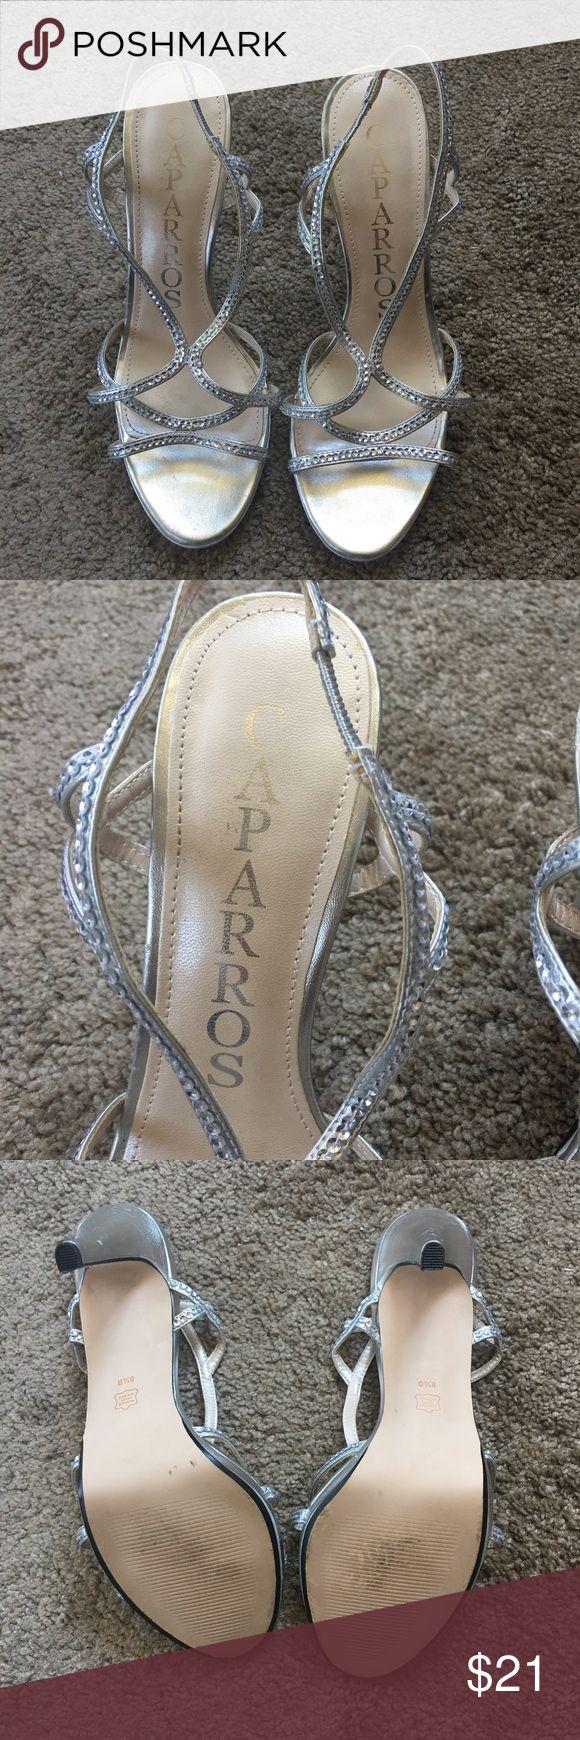 Caparros Women's Shoes Sliver Metallic High Heels, Cross Strap, Open Toe Shoes w/ Bling, Sling Back Straps Caparros Shoes Heels